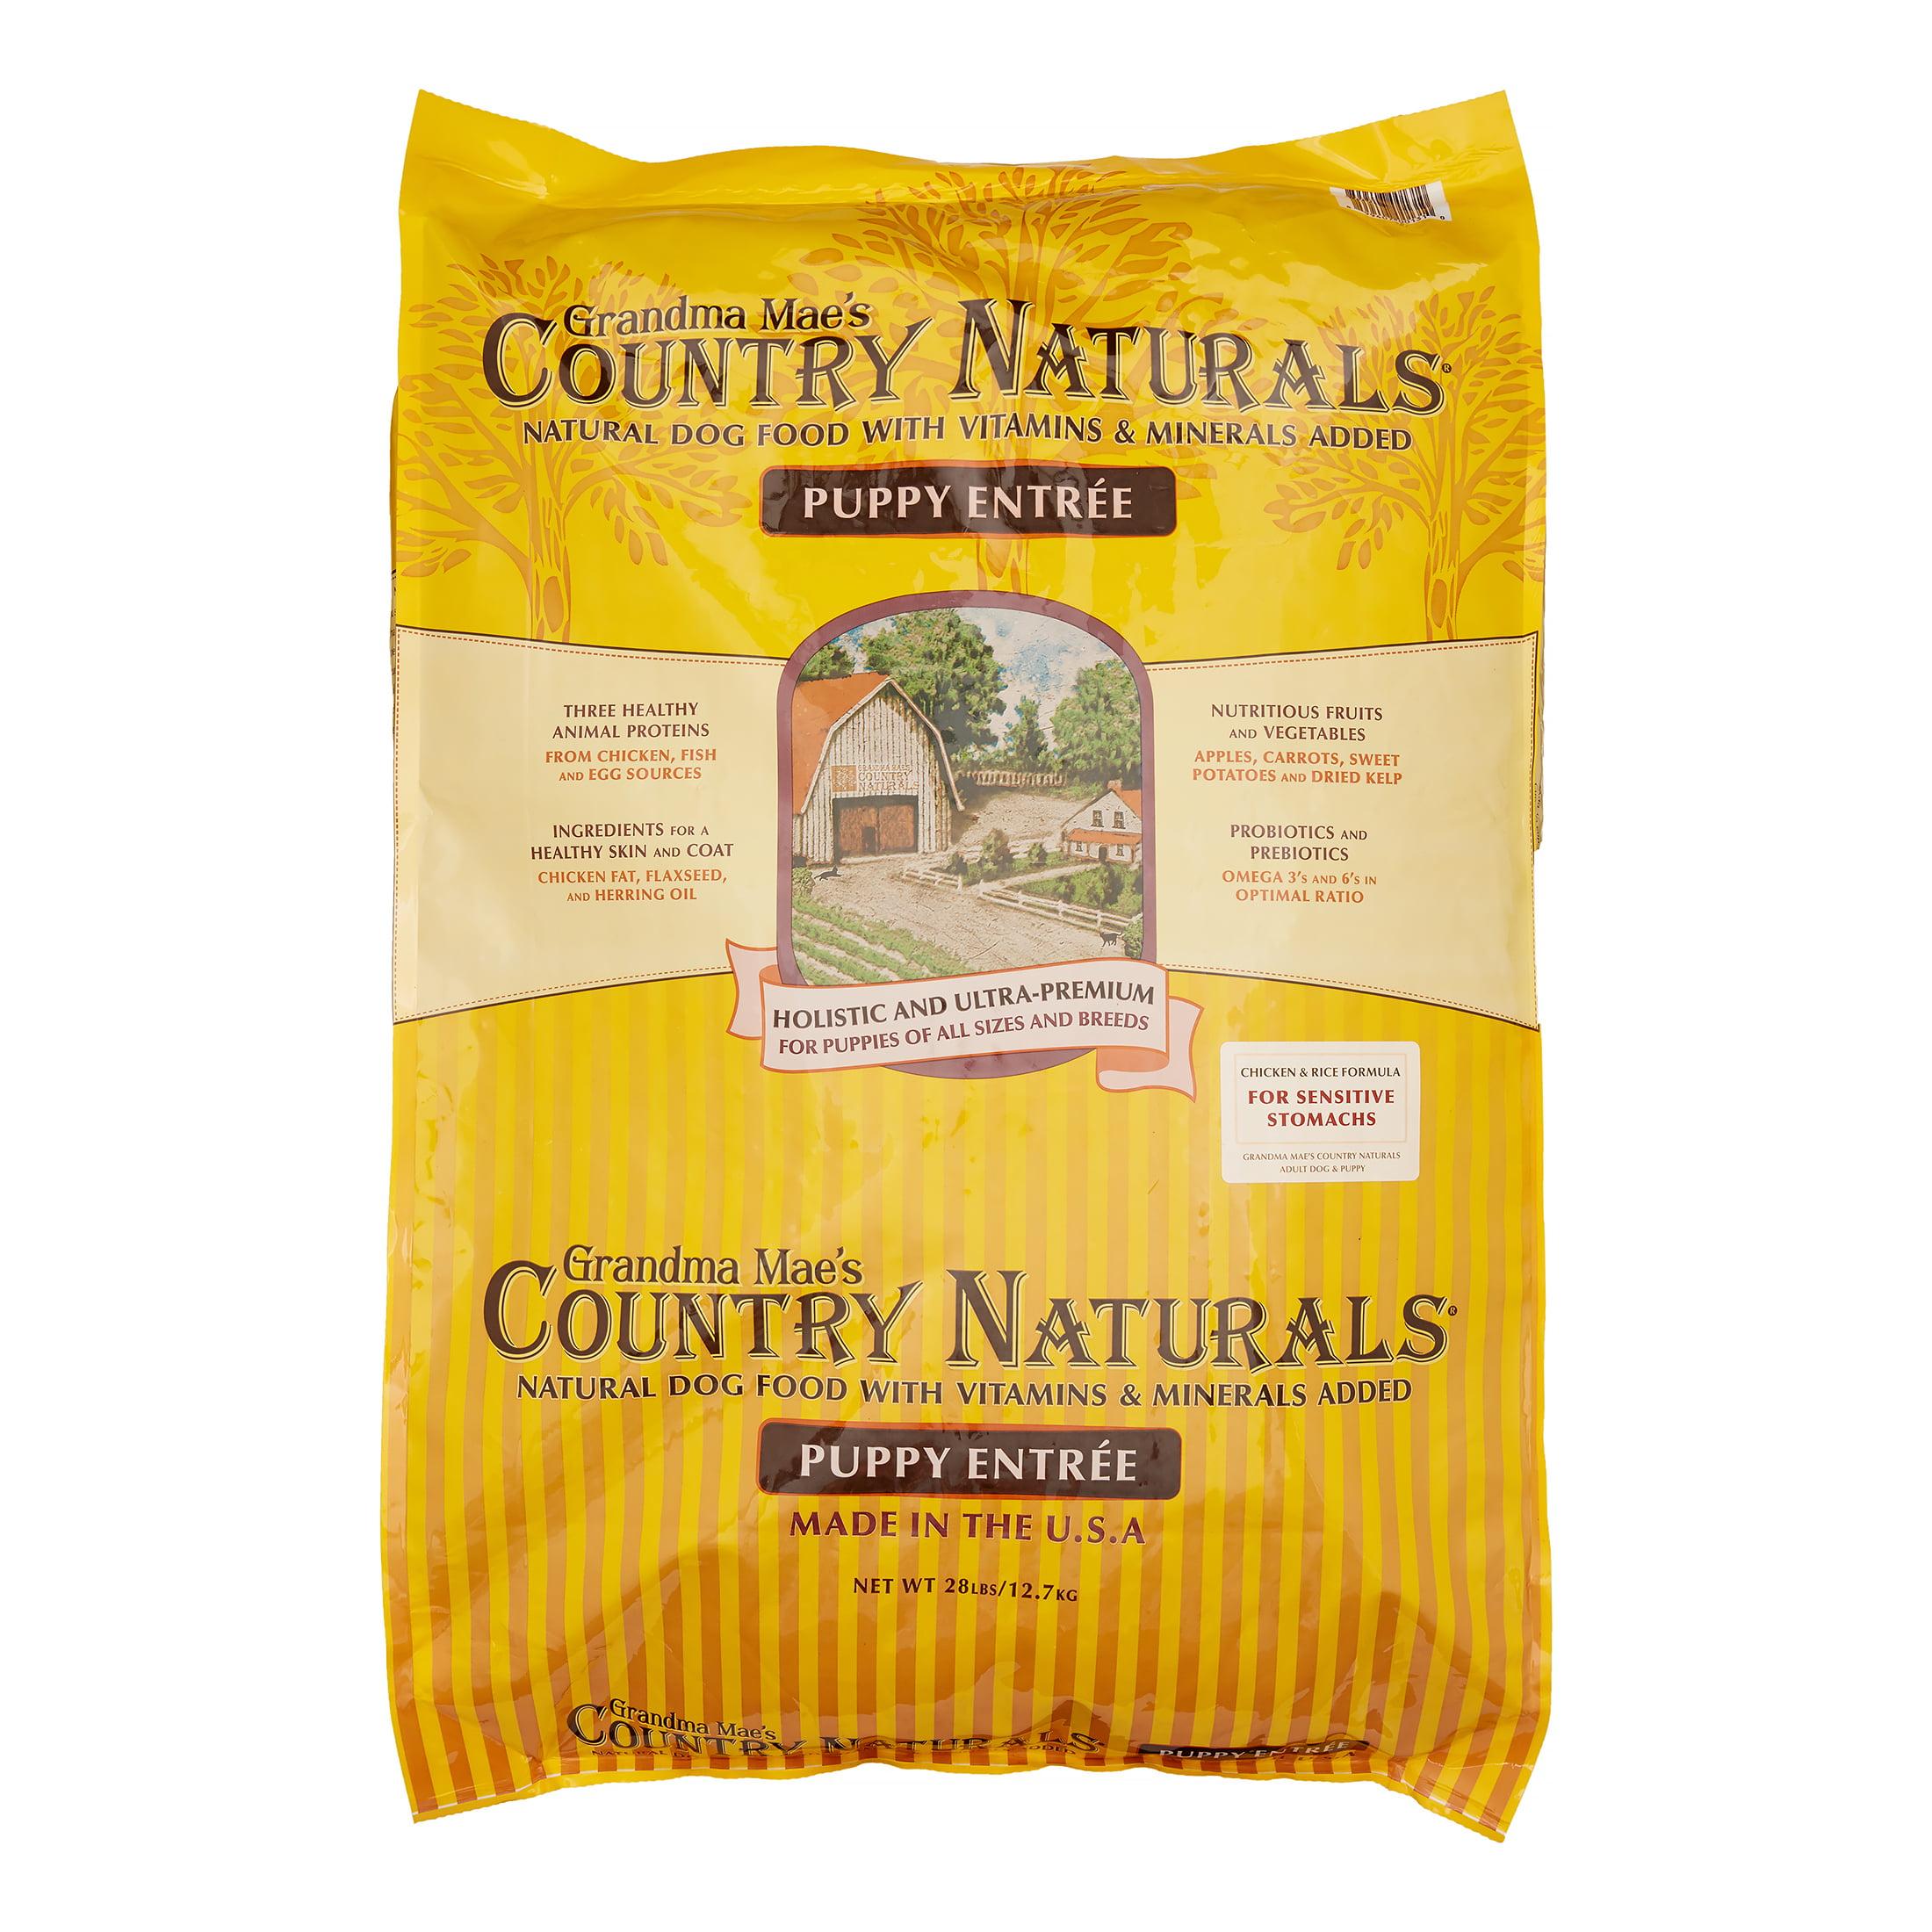 Grandma Mae's Country Naturals Premium All Naturals Puppy Food, 30 Lb by Mars Petcare